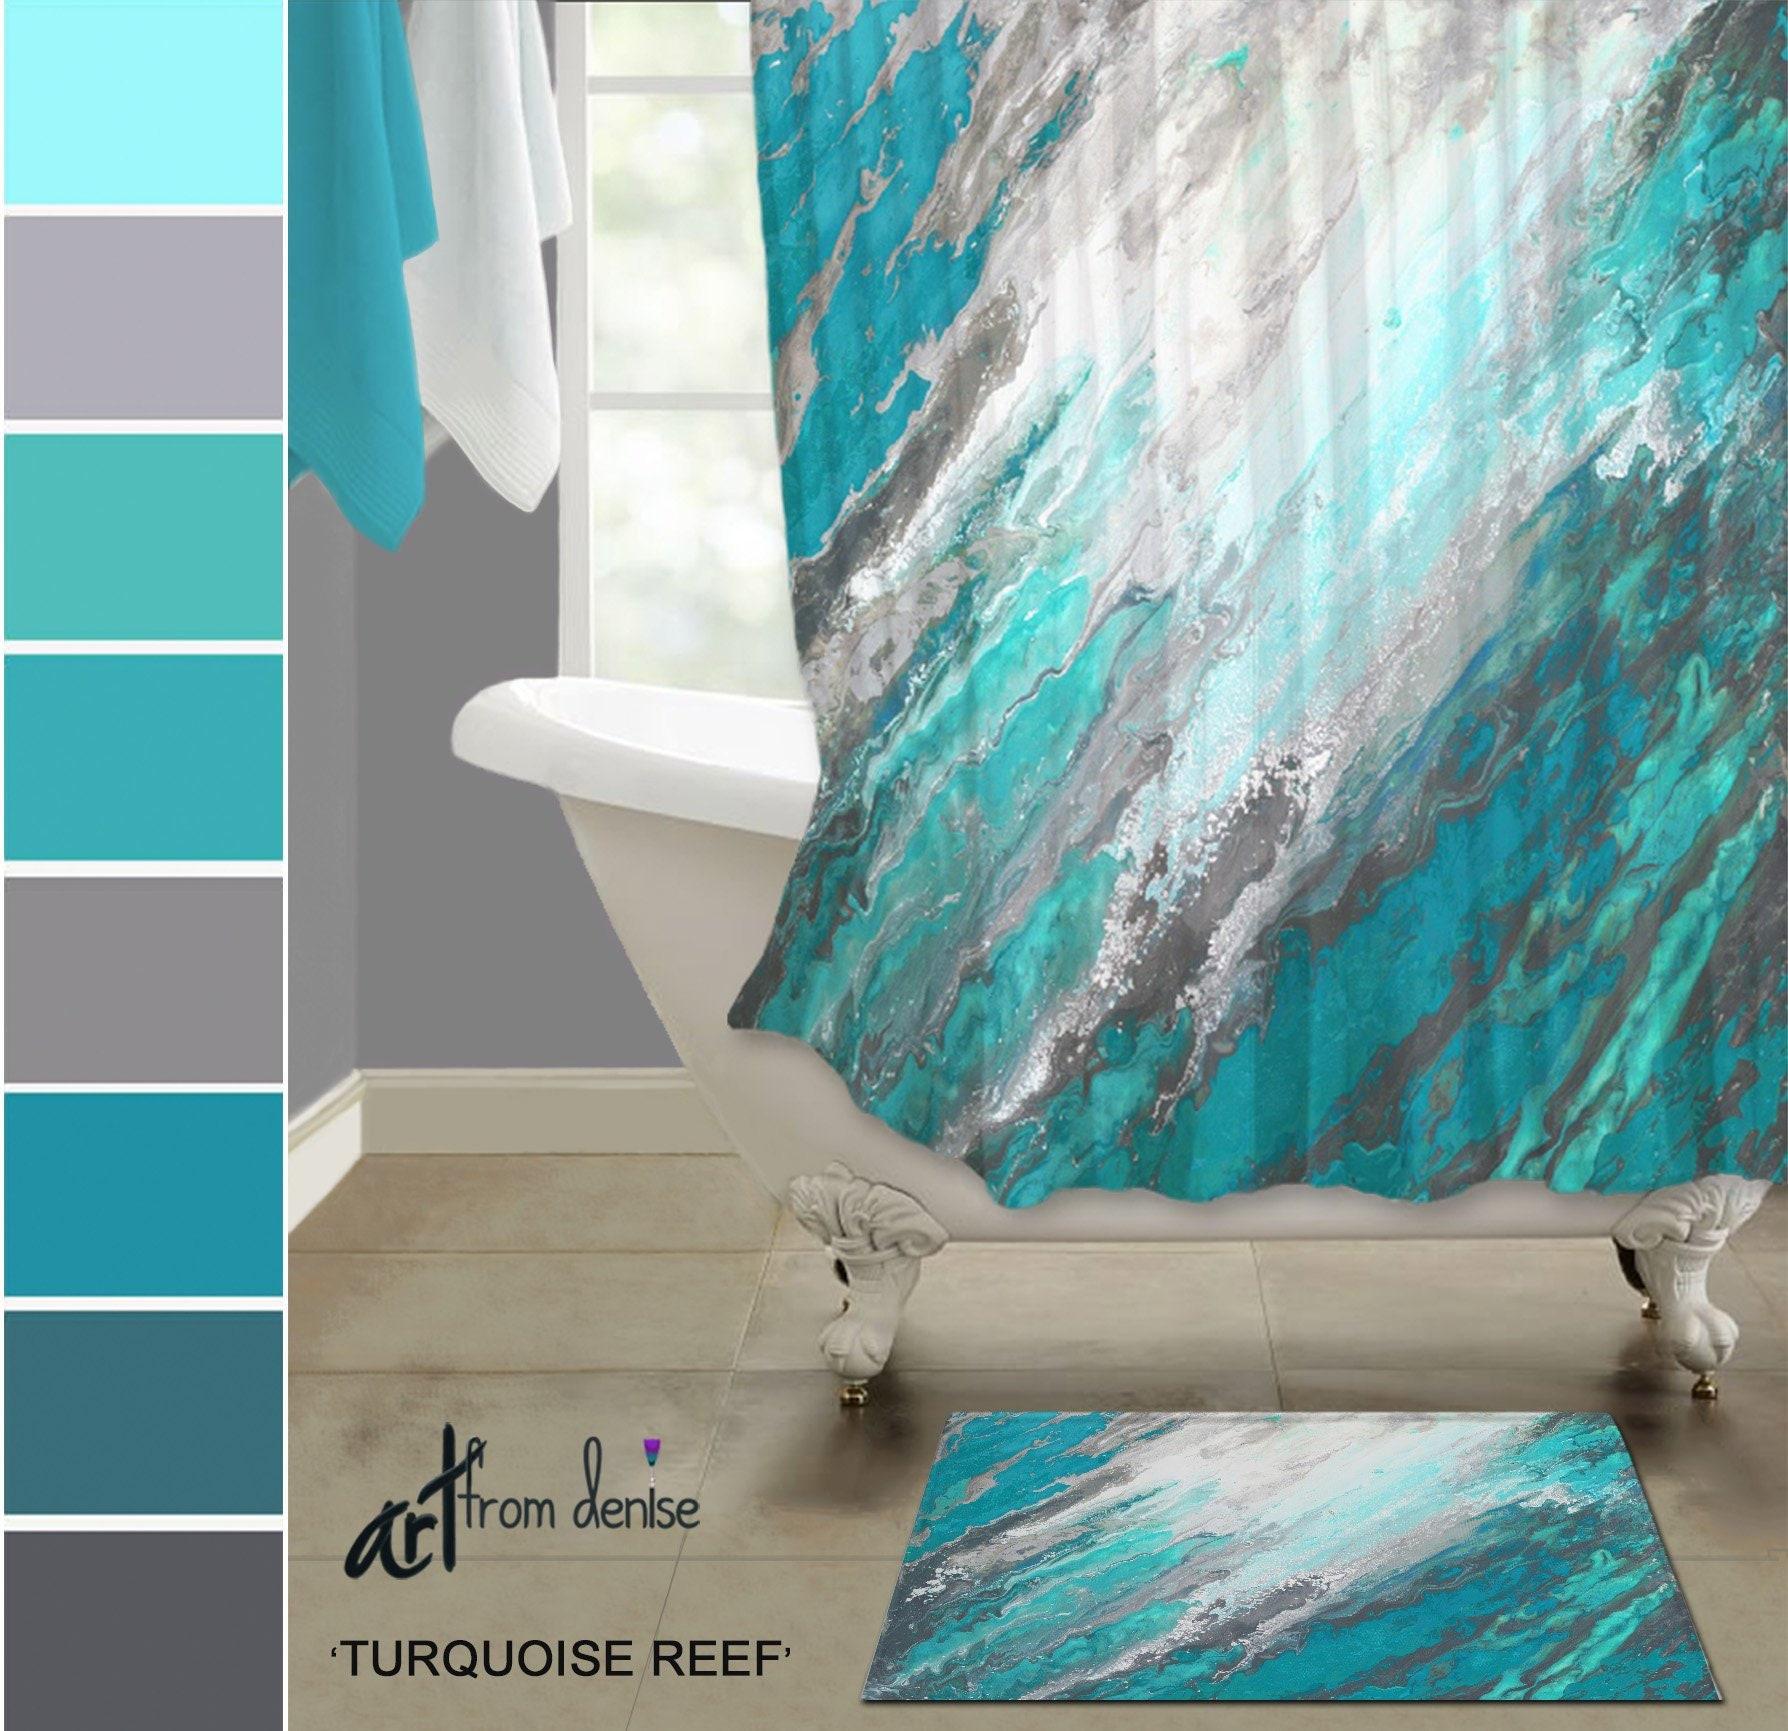 Gray And Teal Shower Curtain And Bath Rug Sets Modern Turquoise Aqua Teal Bathroom Decor Abstract Fabric Shower Stall Curtain Bath Mat